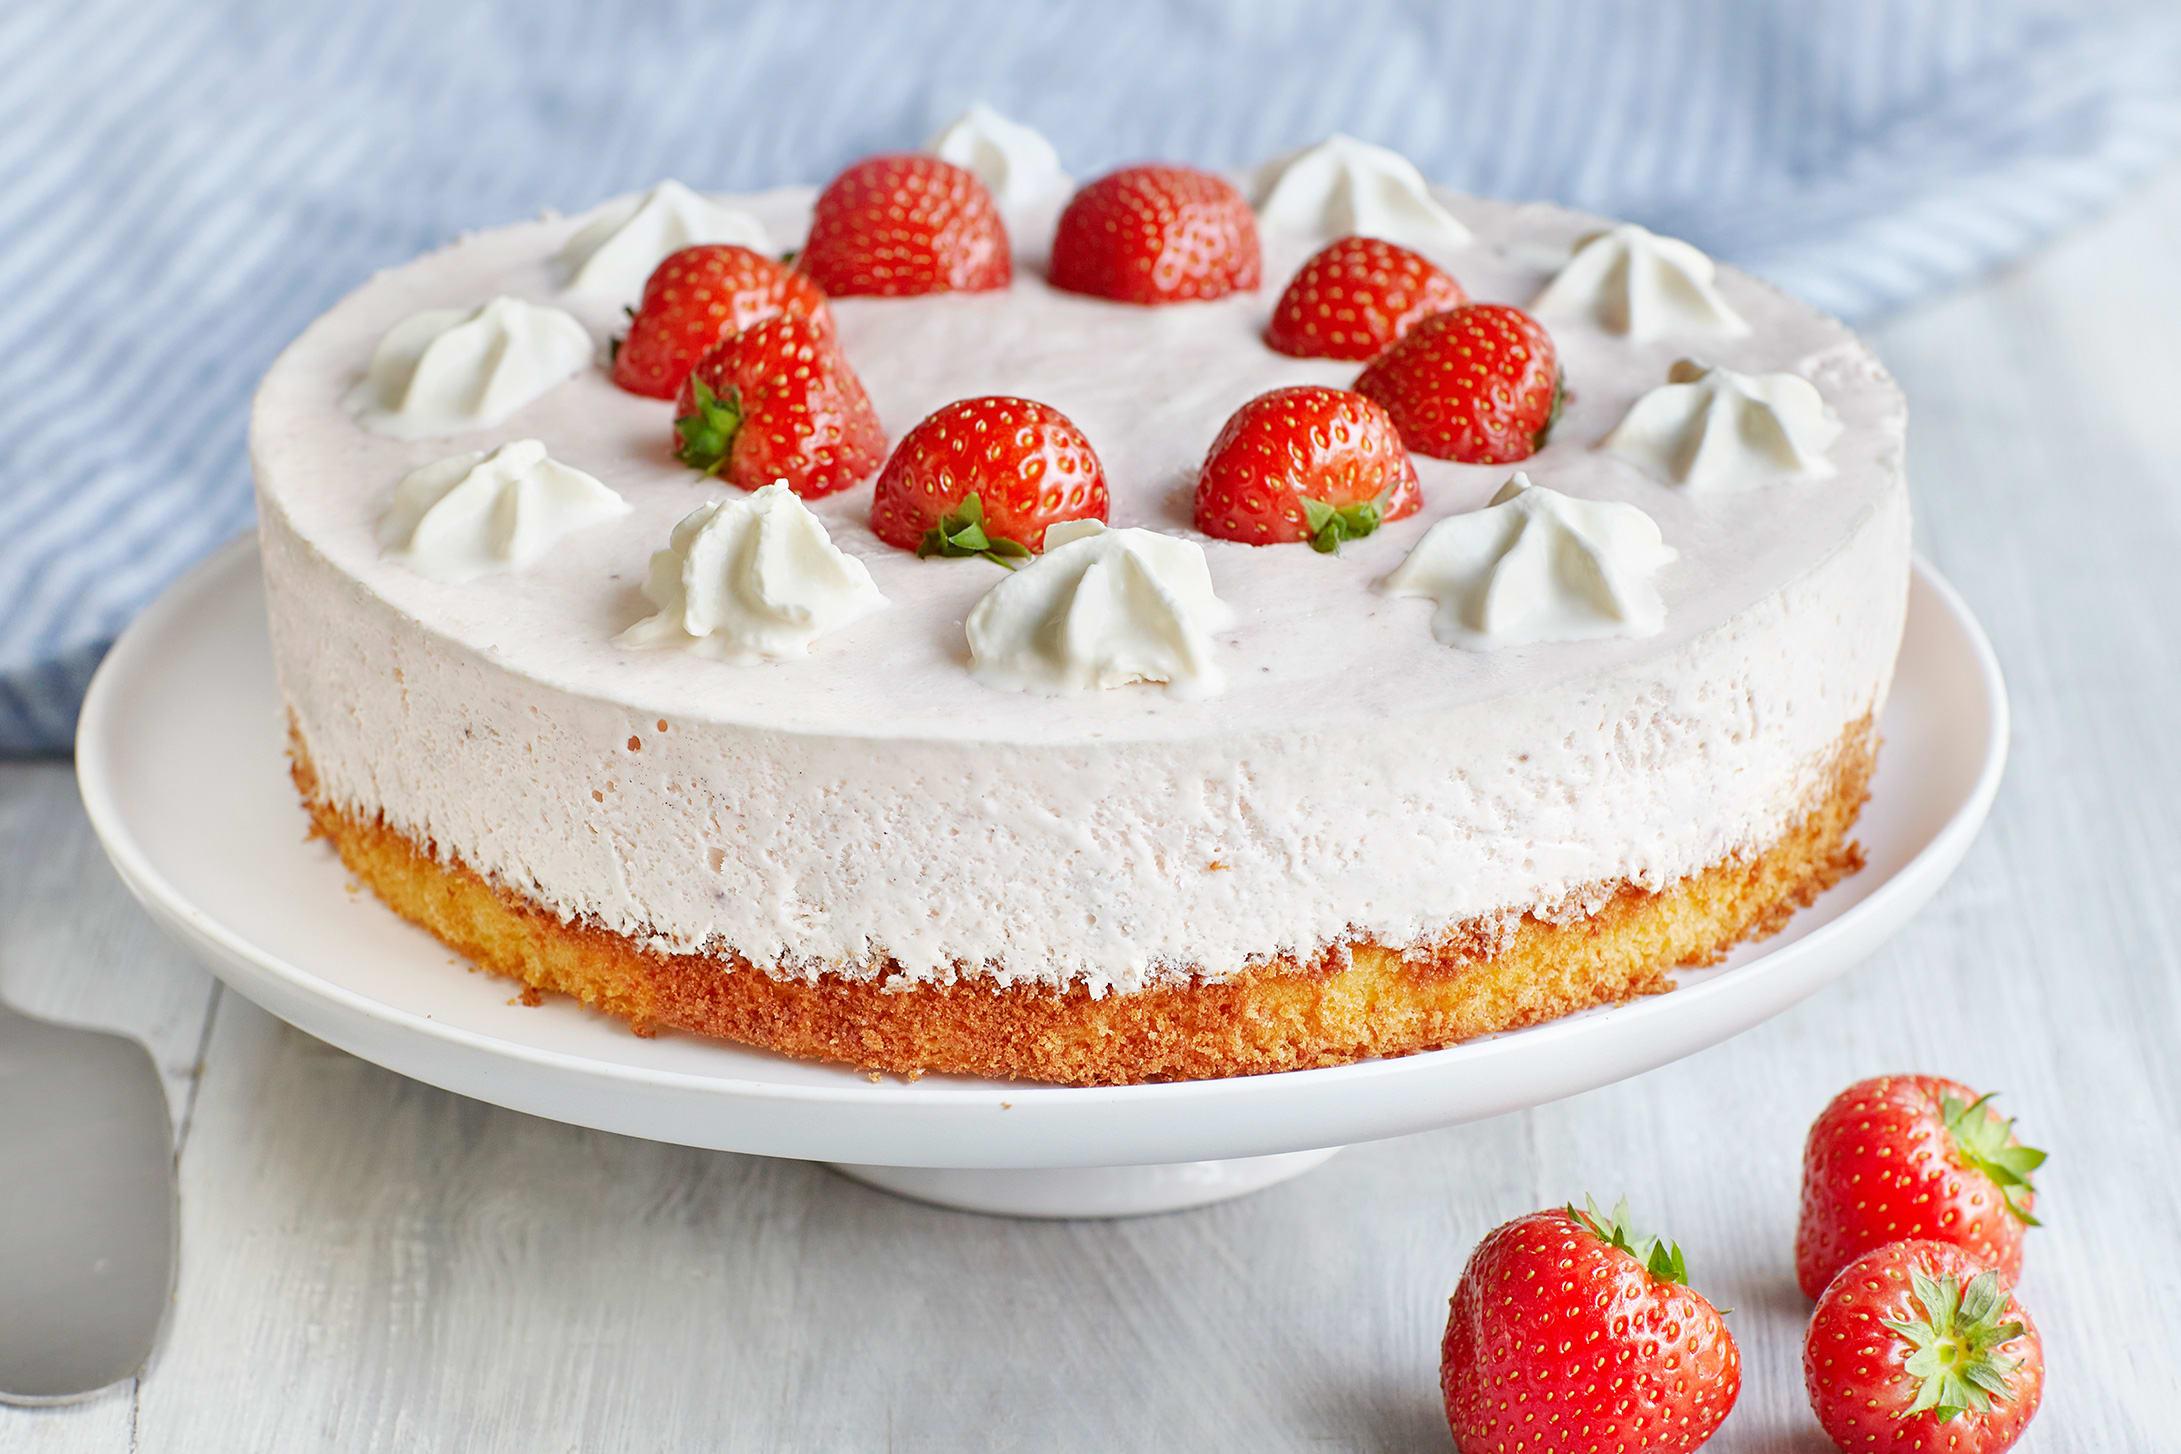 Erdbeer-Quarktorte